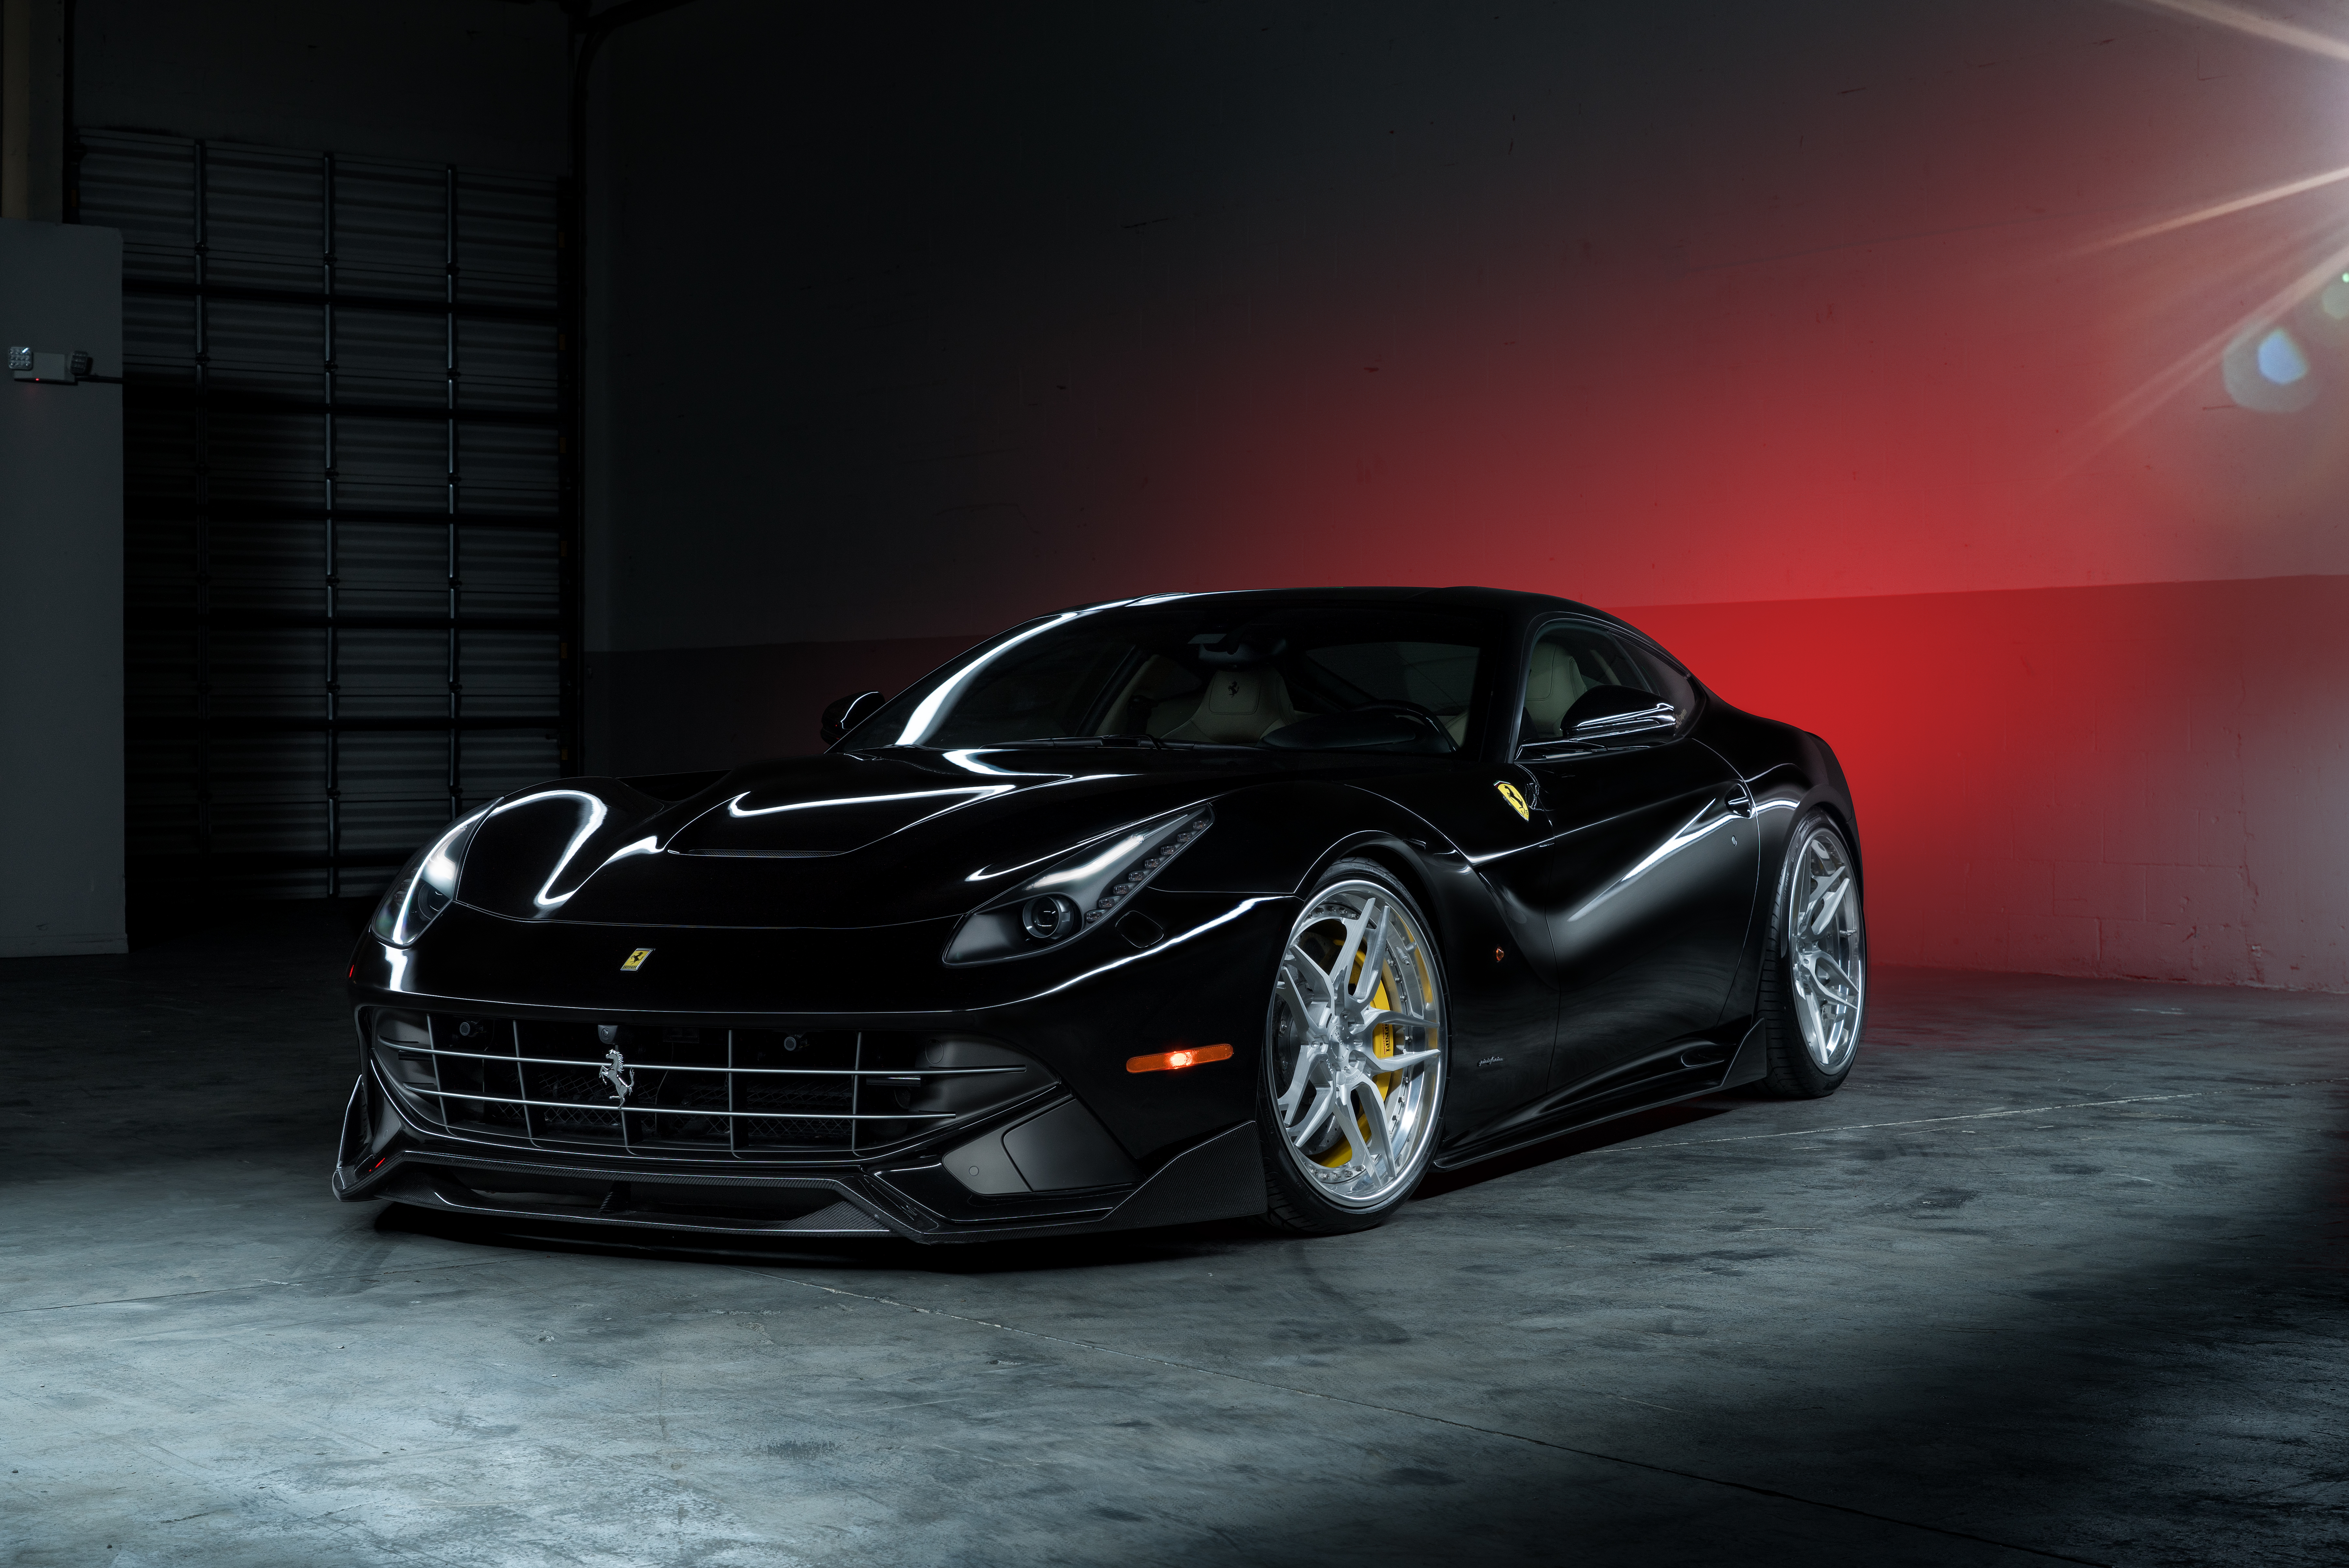 Ferrari F12 дорога забор  № 2437929 без смс